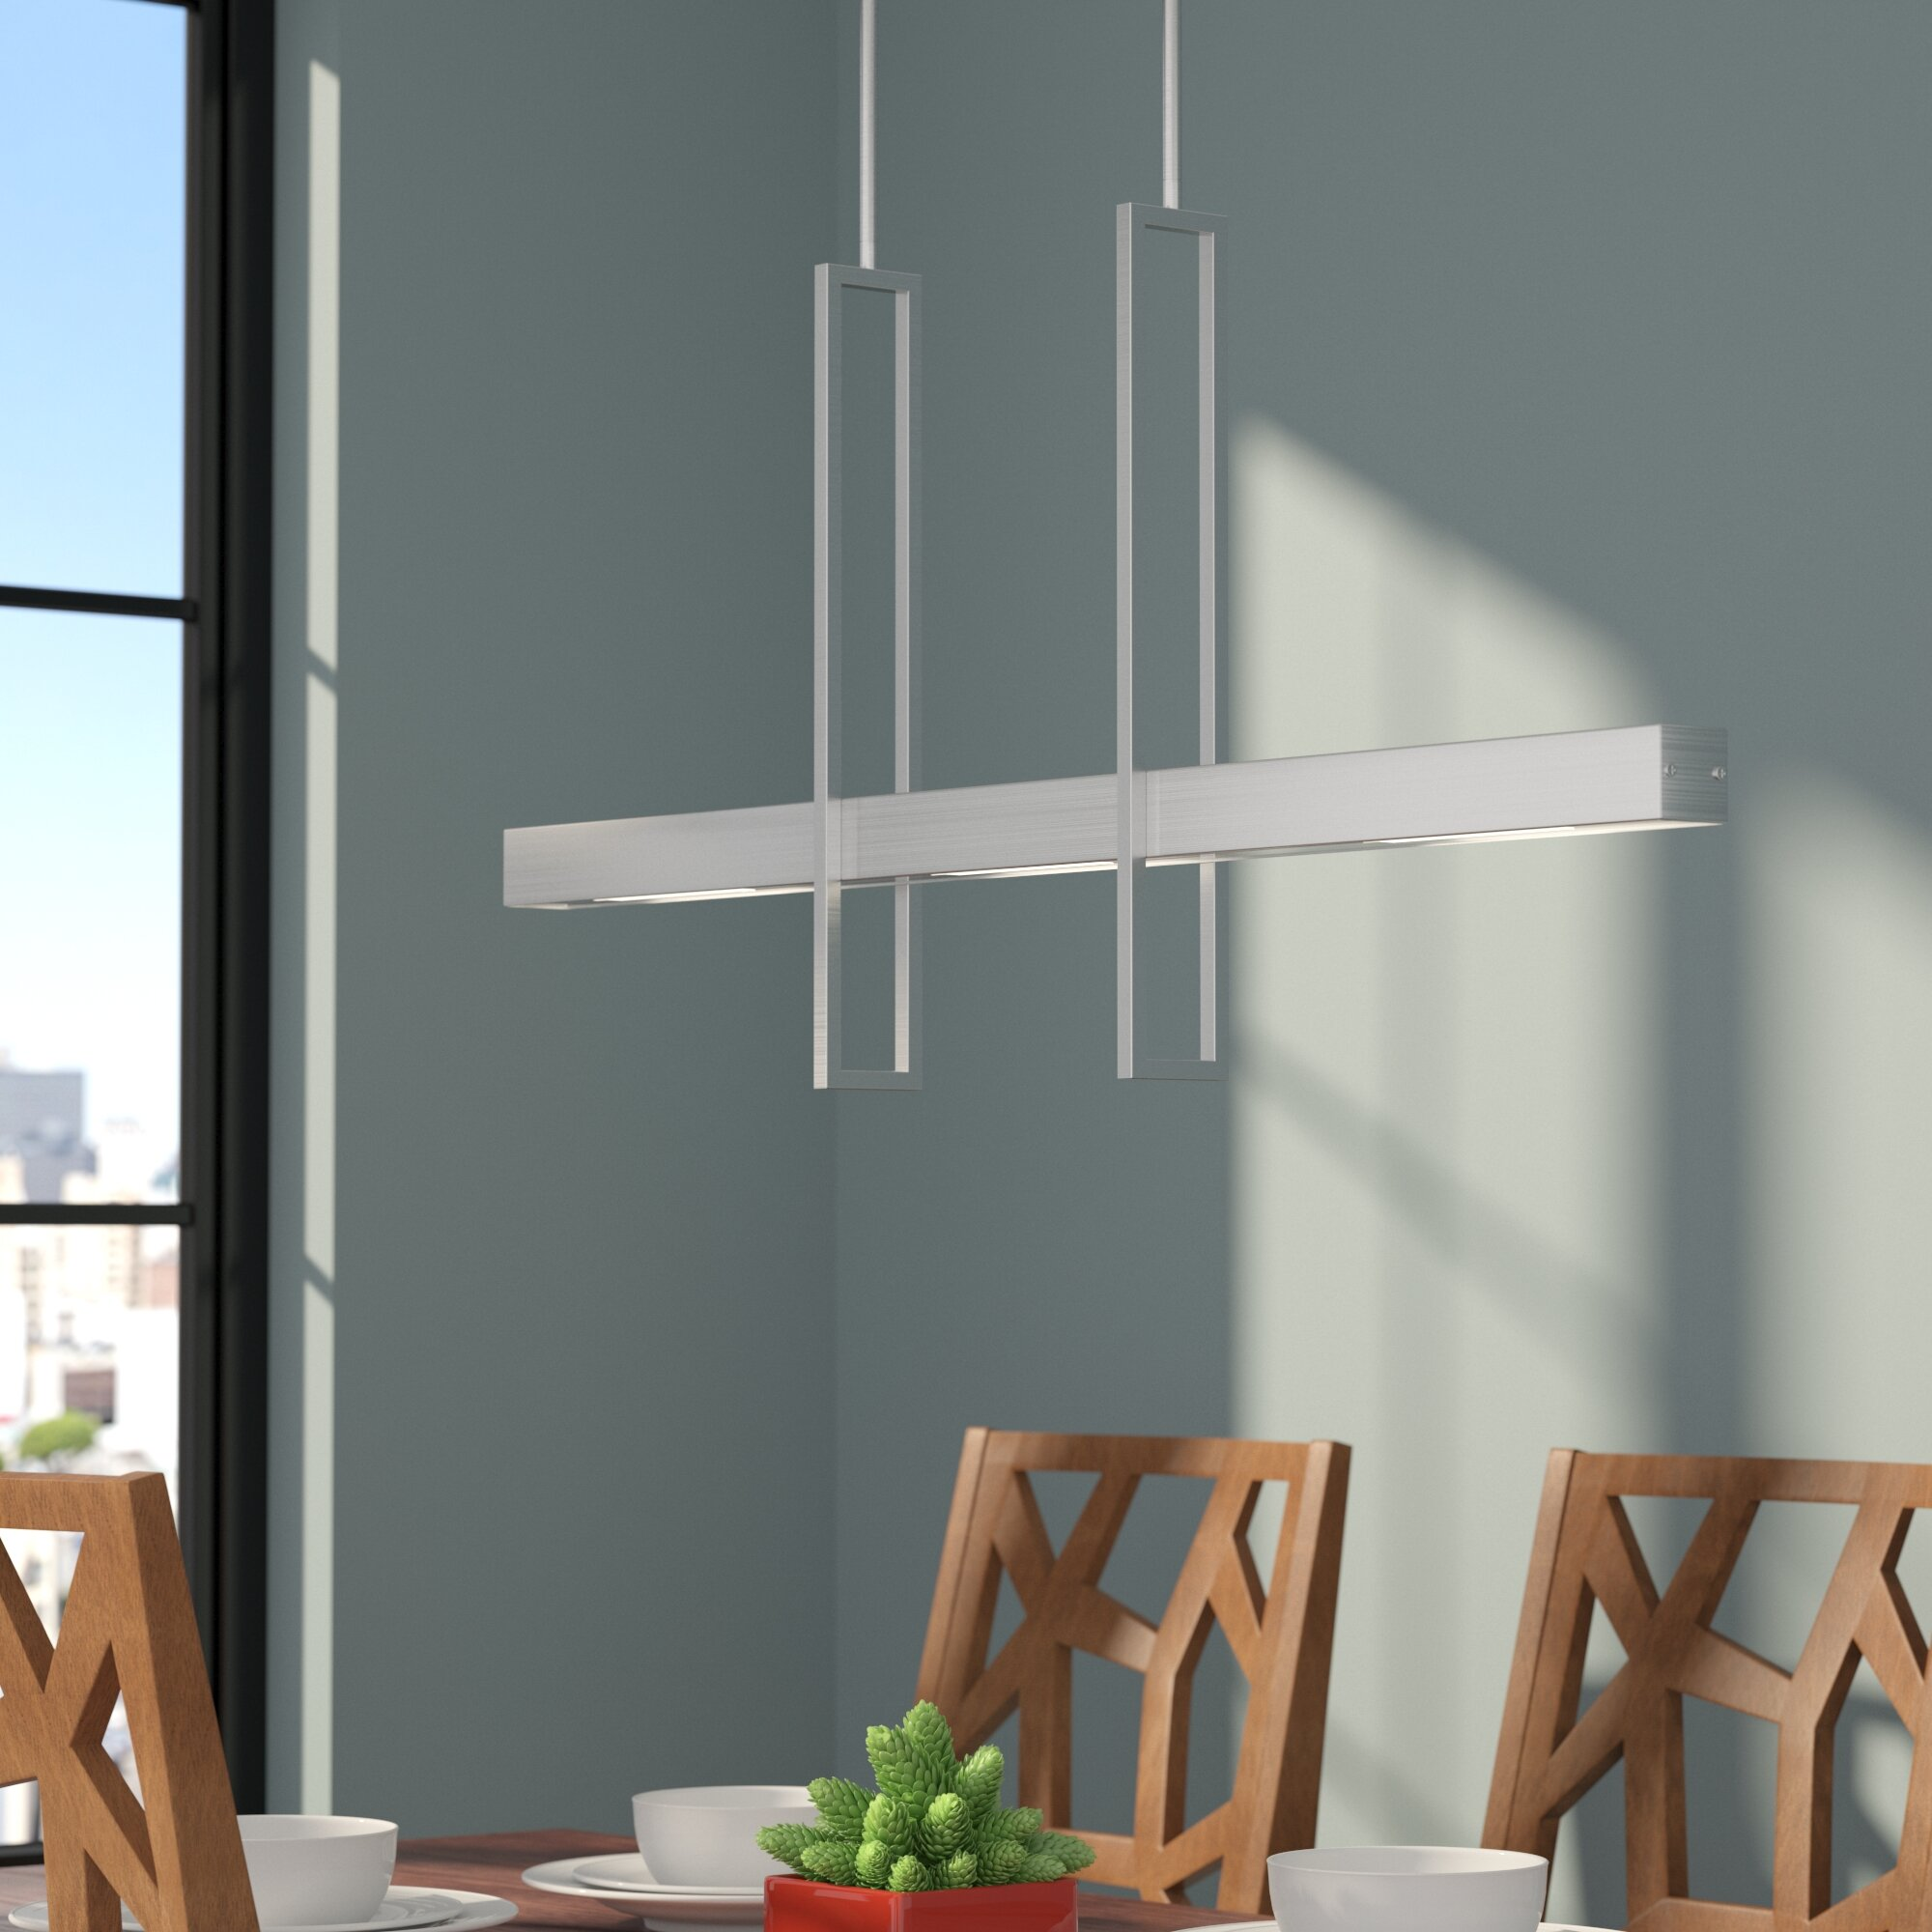 Callington 2 light led kitchen island pendant